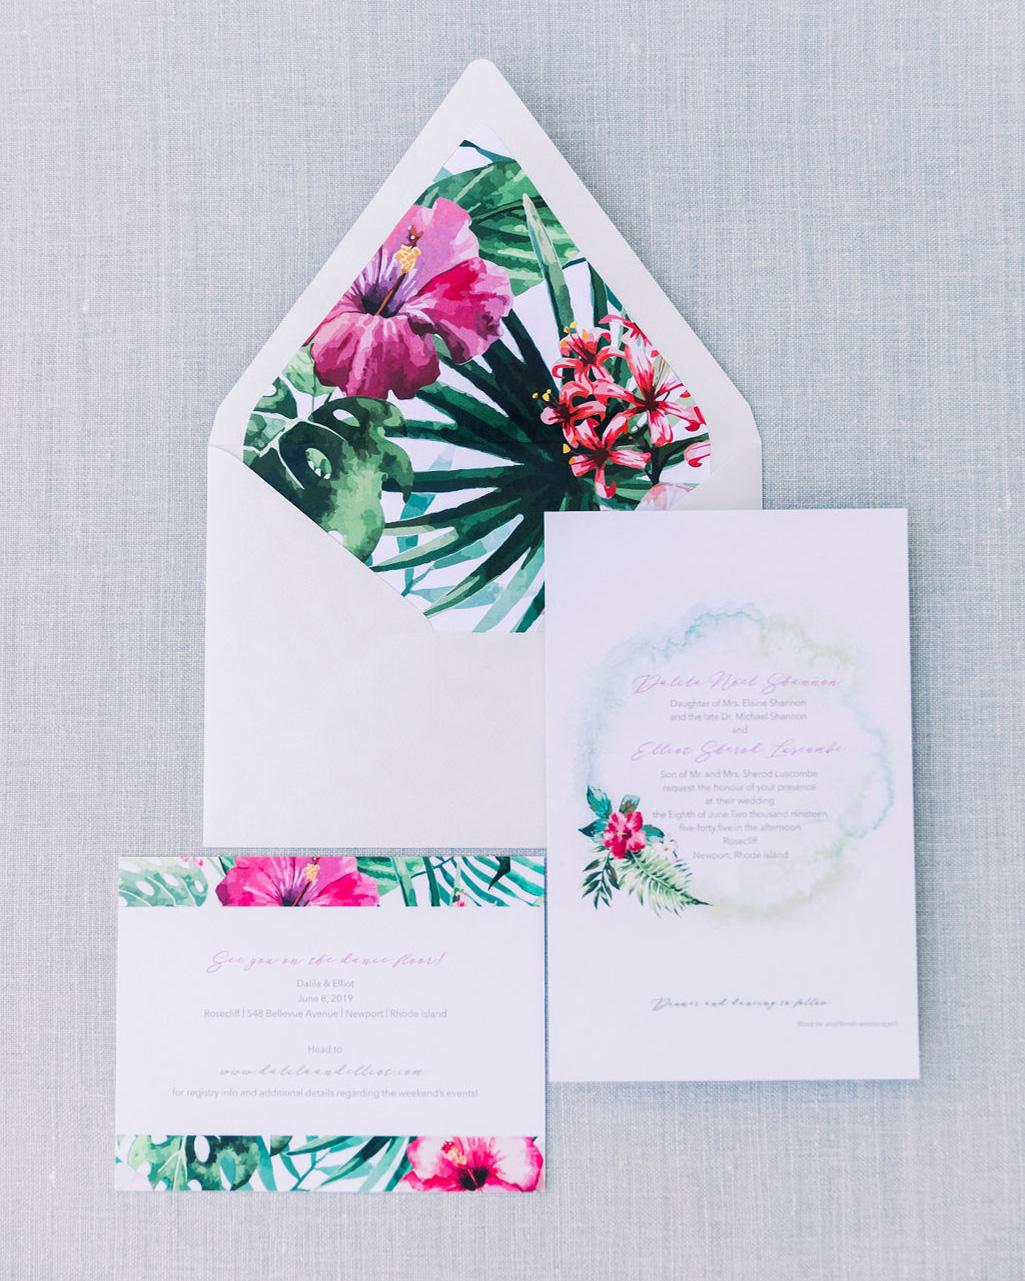 dalila elliot tropical and white wedding invitations